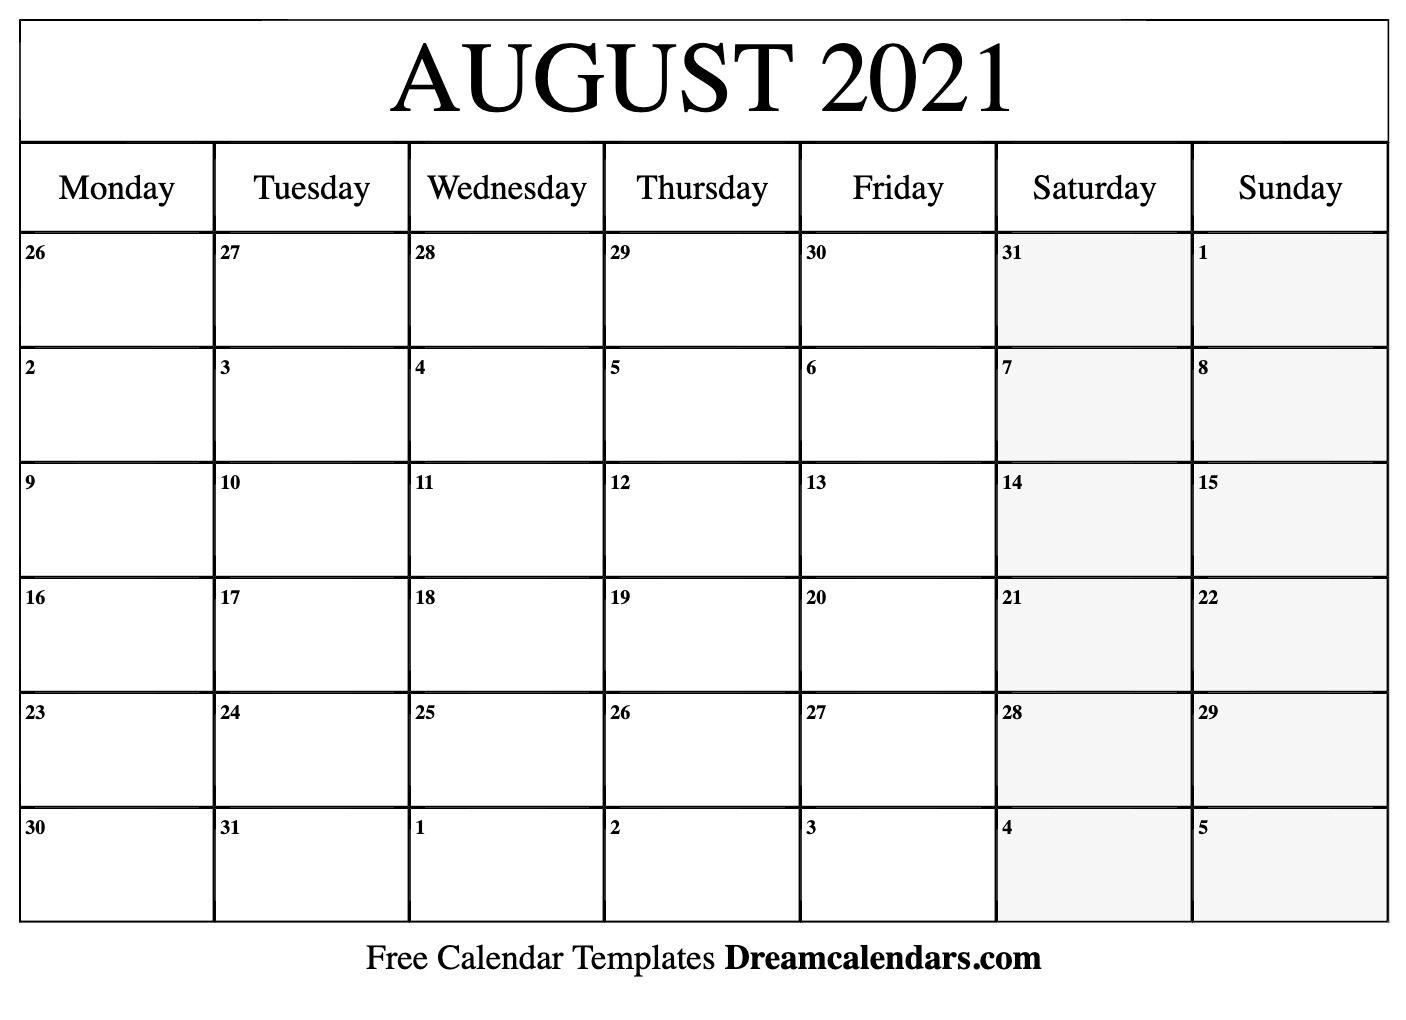 August 2021 Calendar | Free Blank Printable Templates